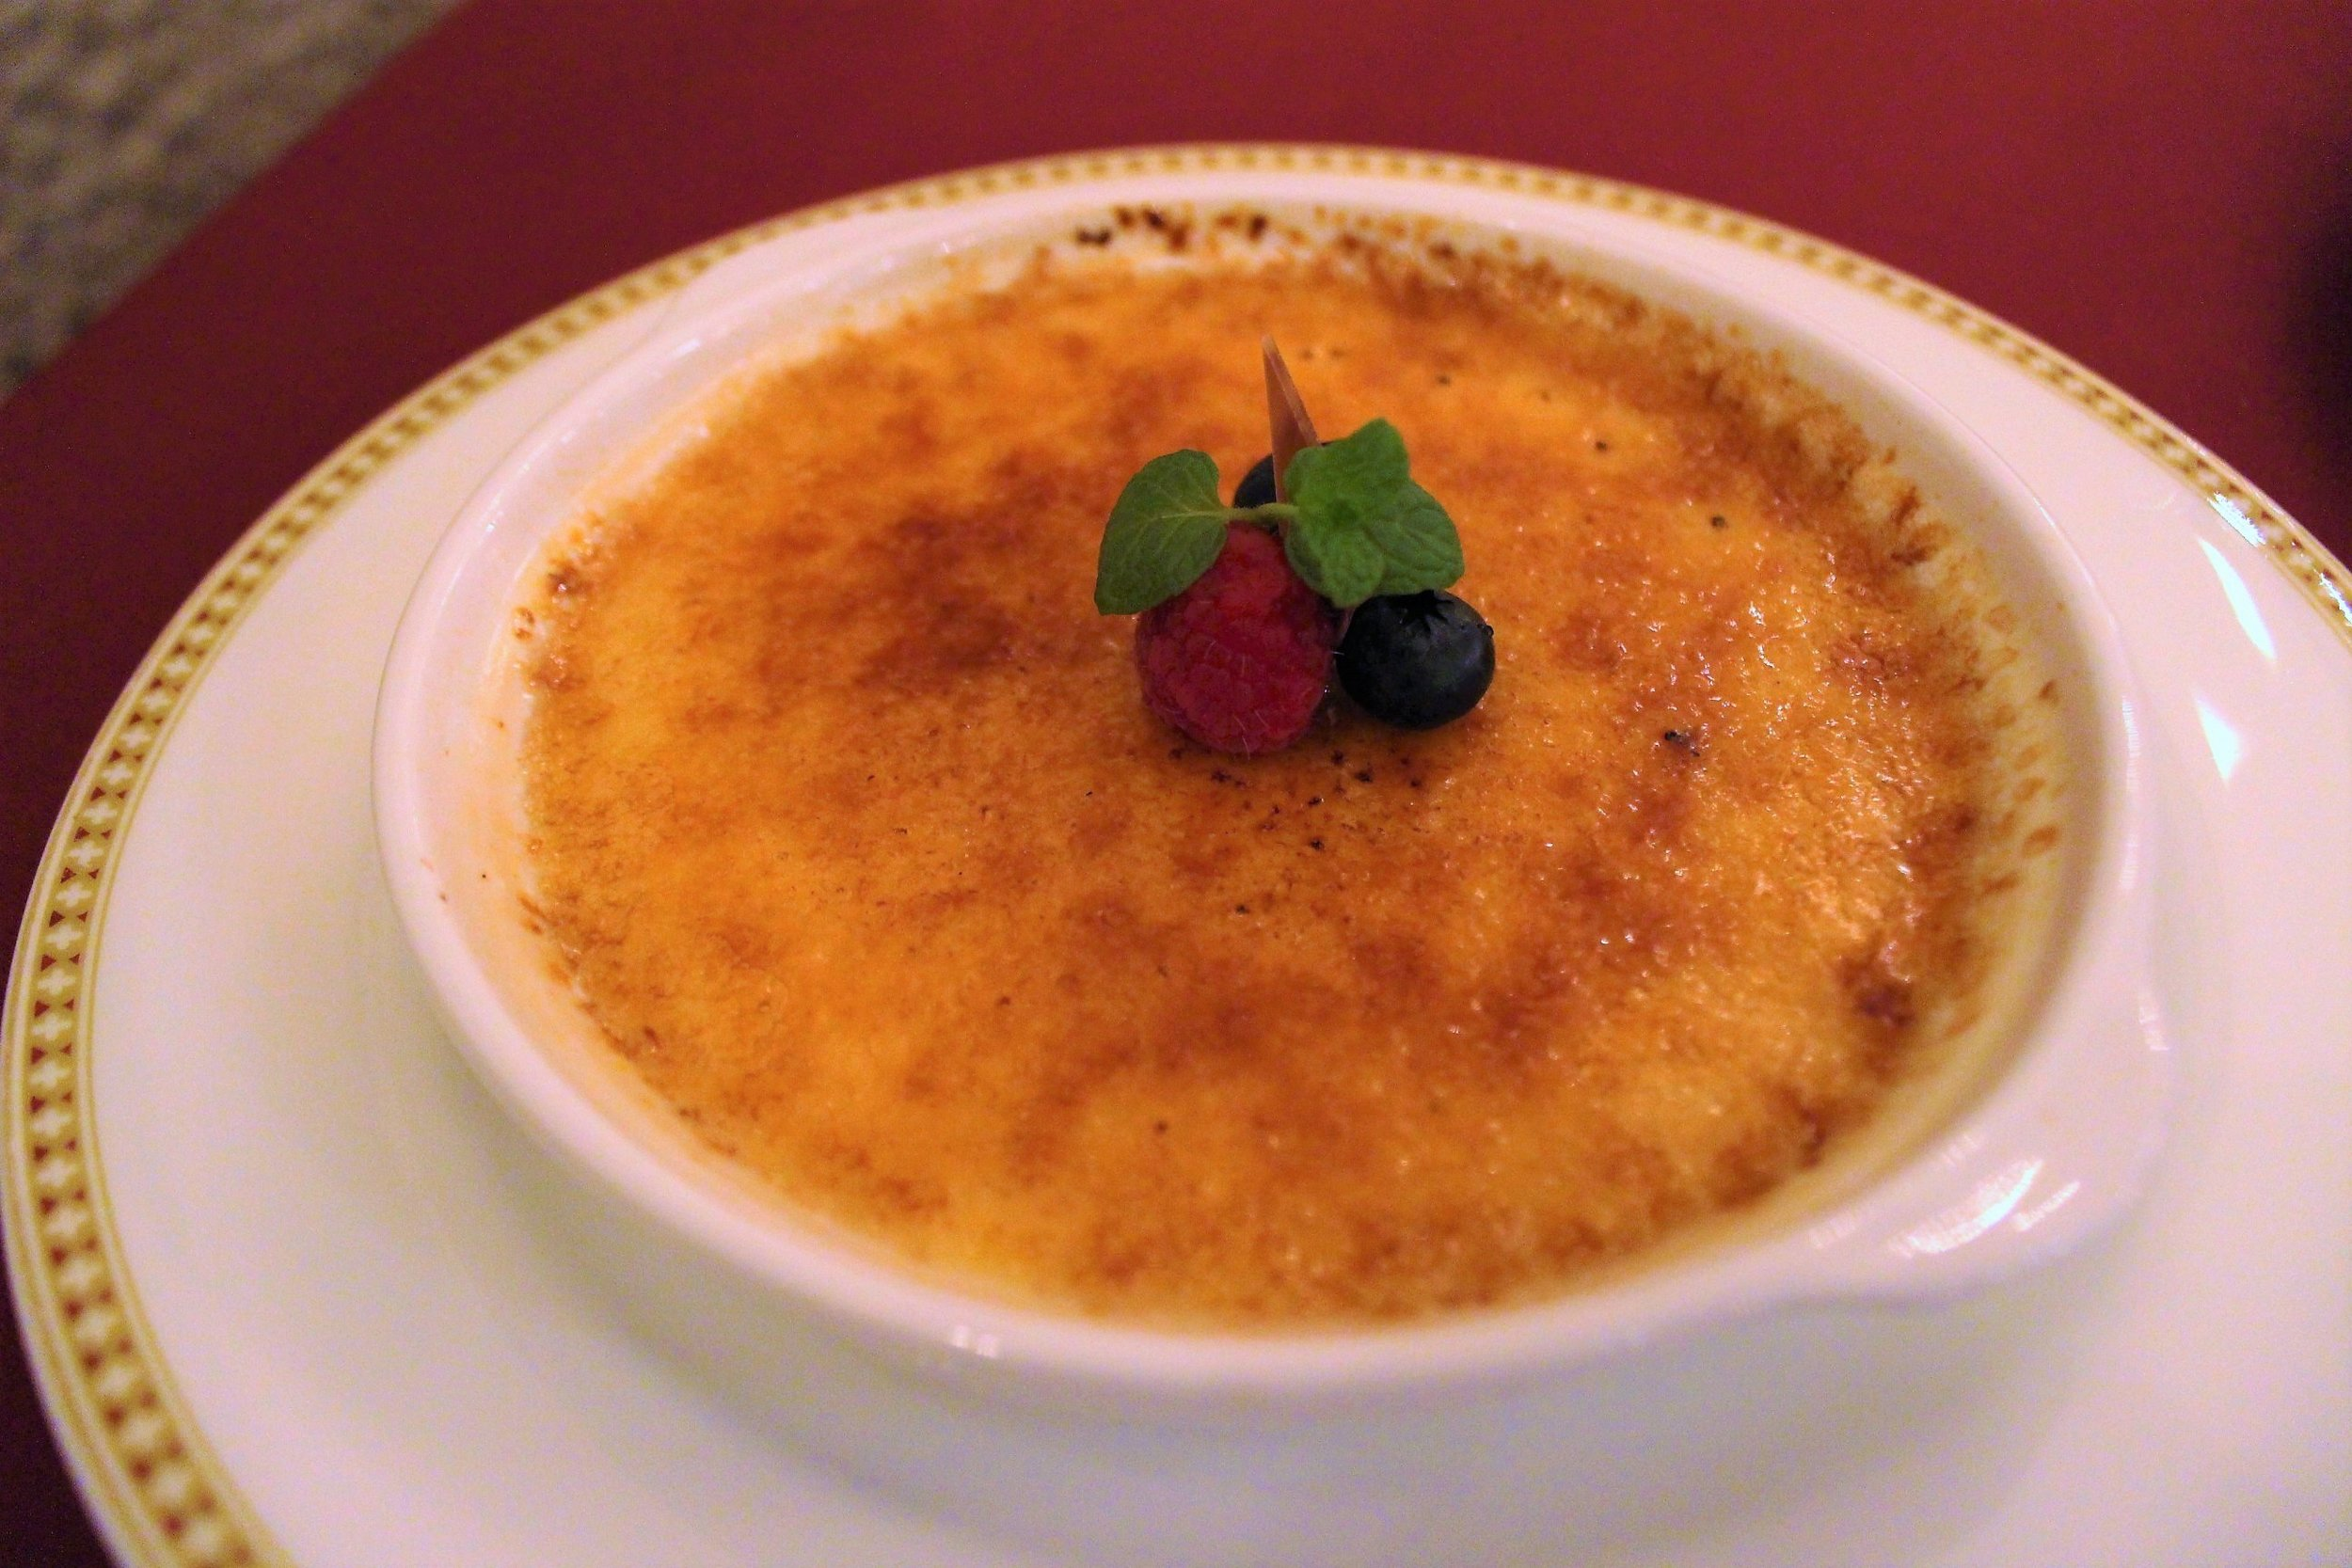 Crème Brûlée at Magellan's in DisneySea, Tokyo, Japan